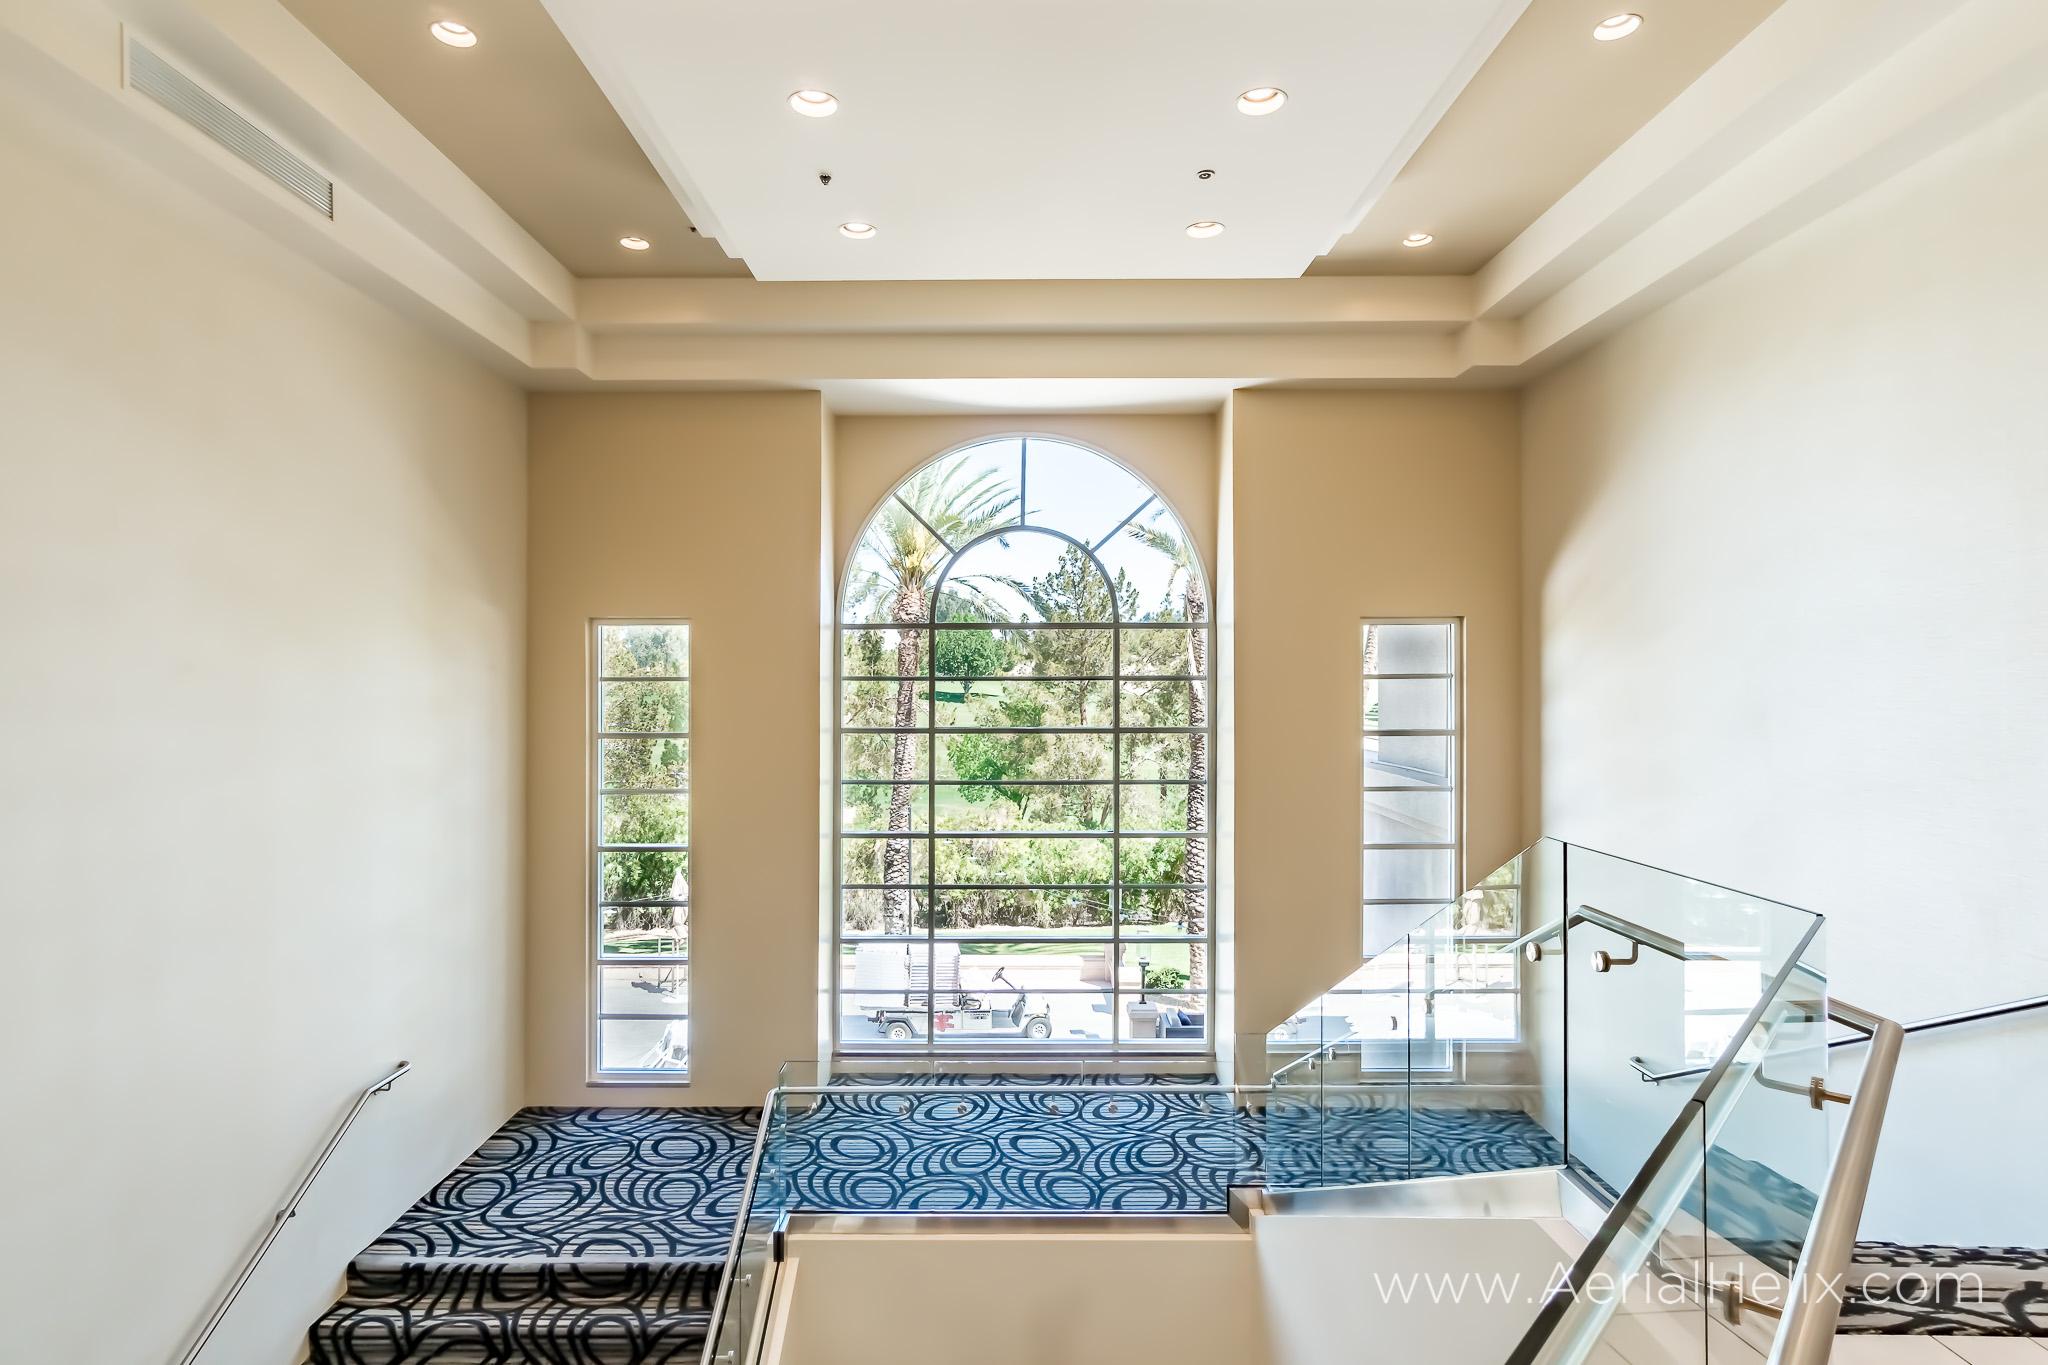 Indian Wells Hyatt Regency Set 1-106.jpg